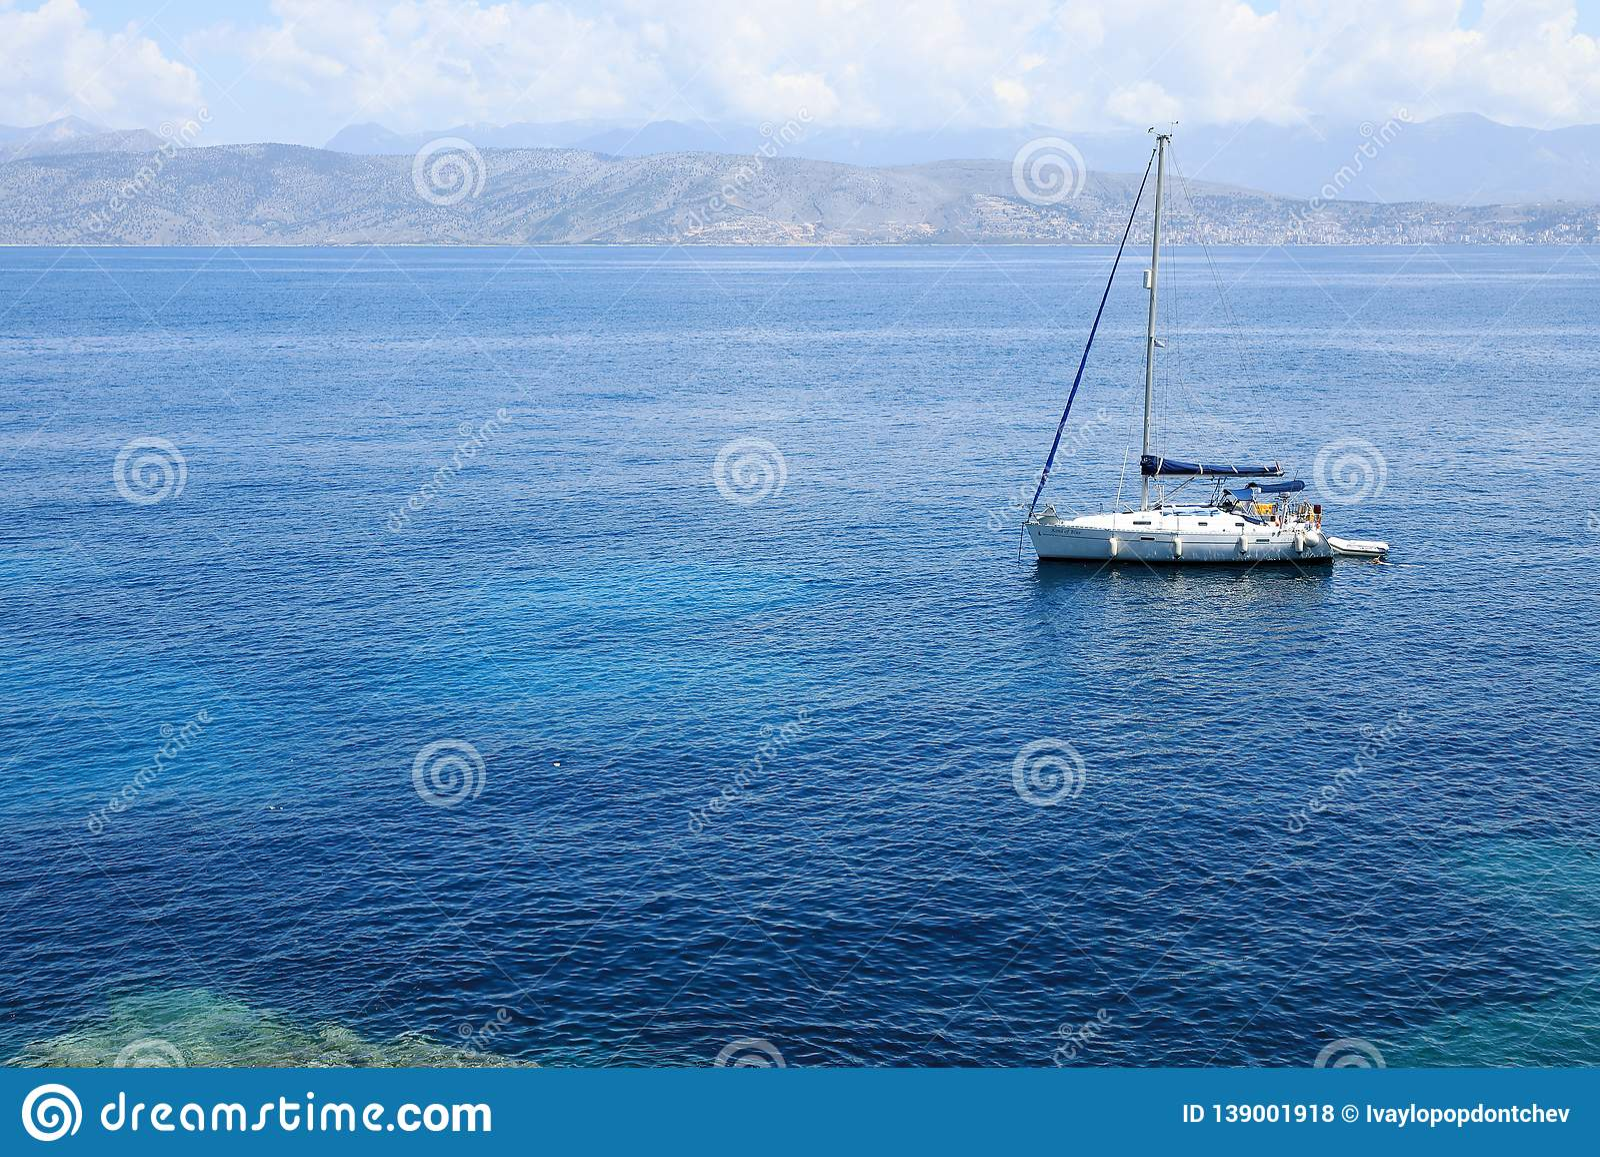 A yacht in Ionian Sea near Kanoni Beach, Kassiopi Village, Corfu Island, Greece, Europe